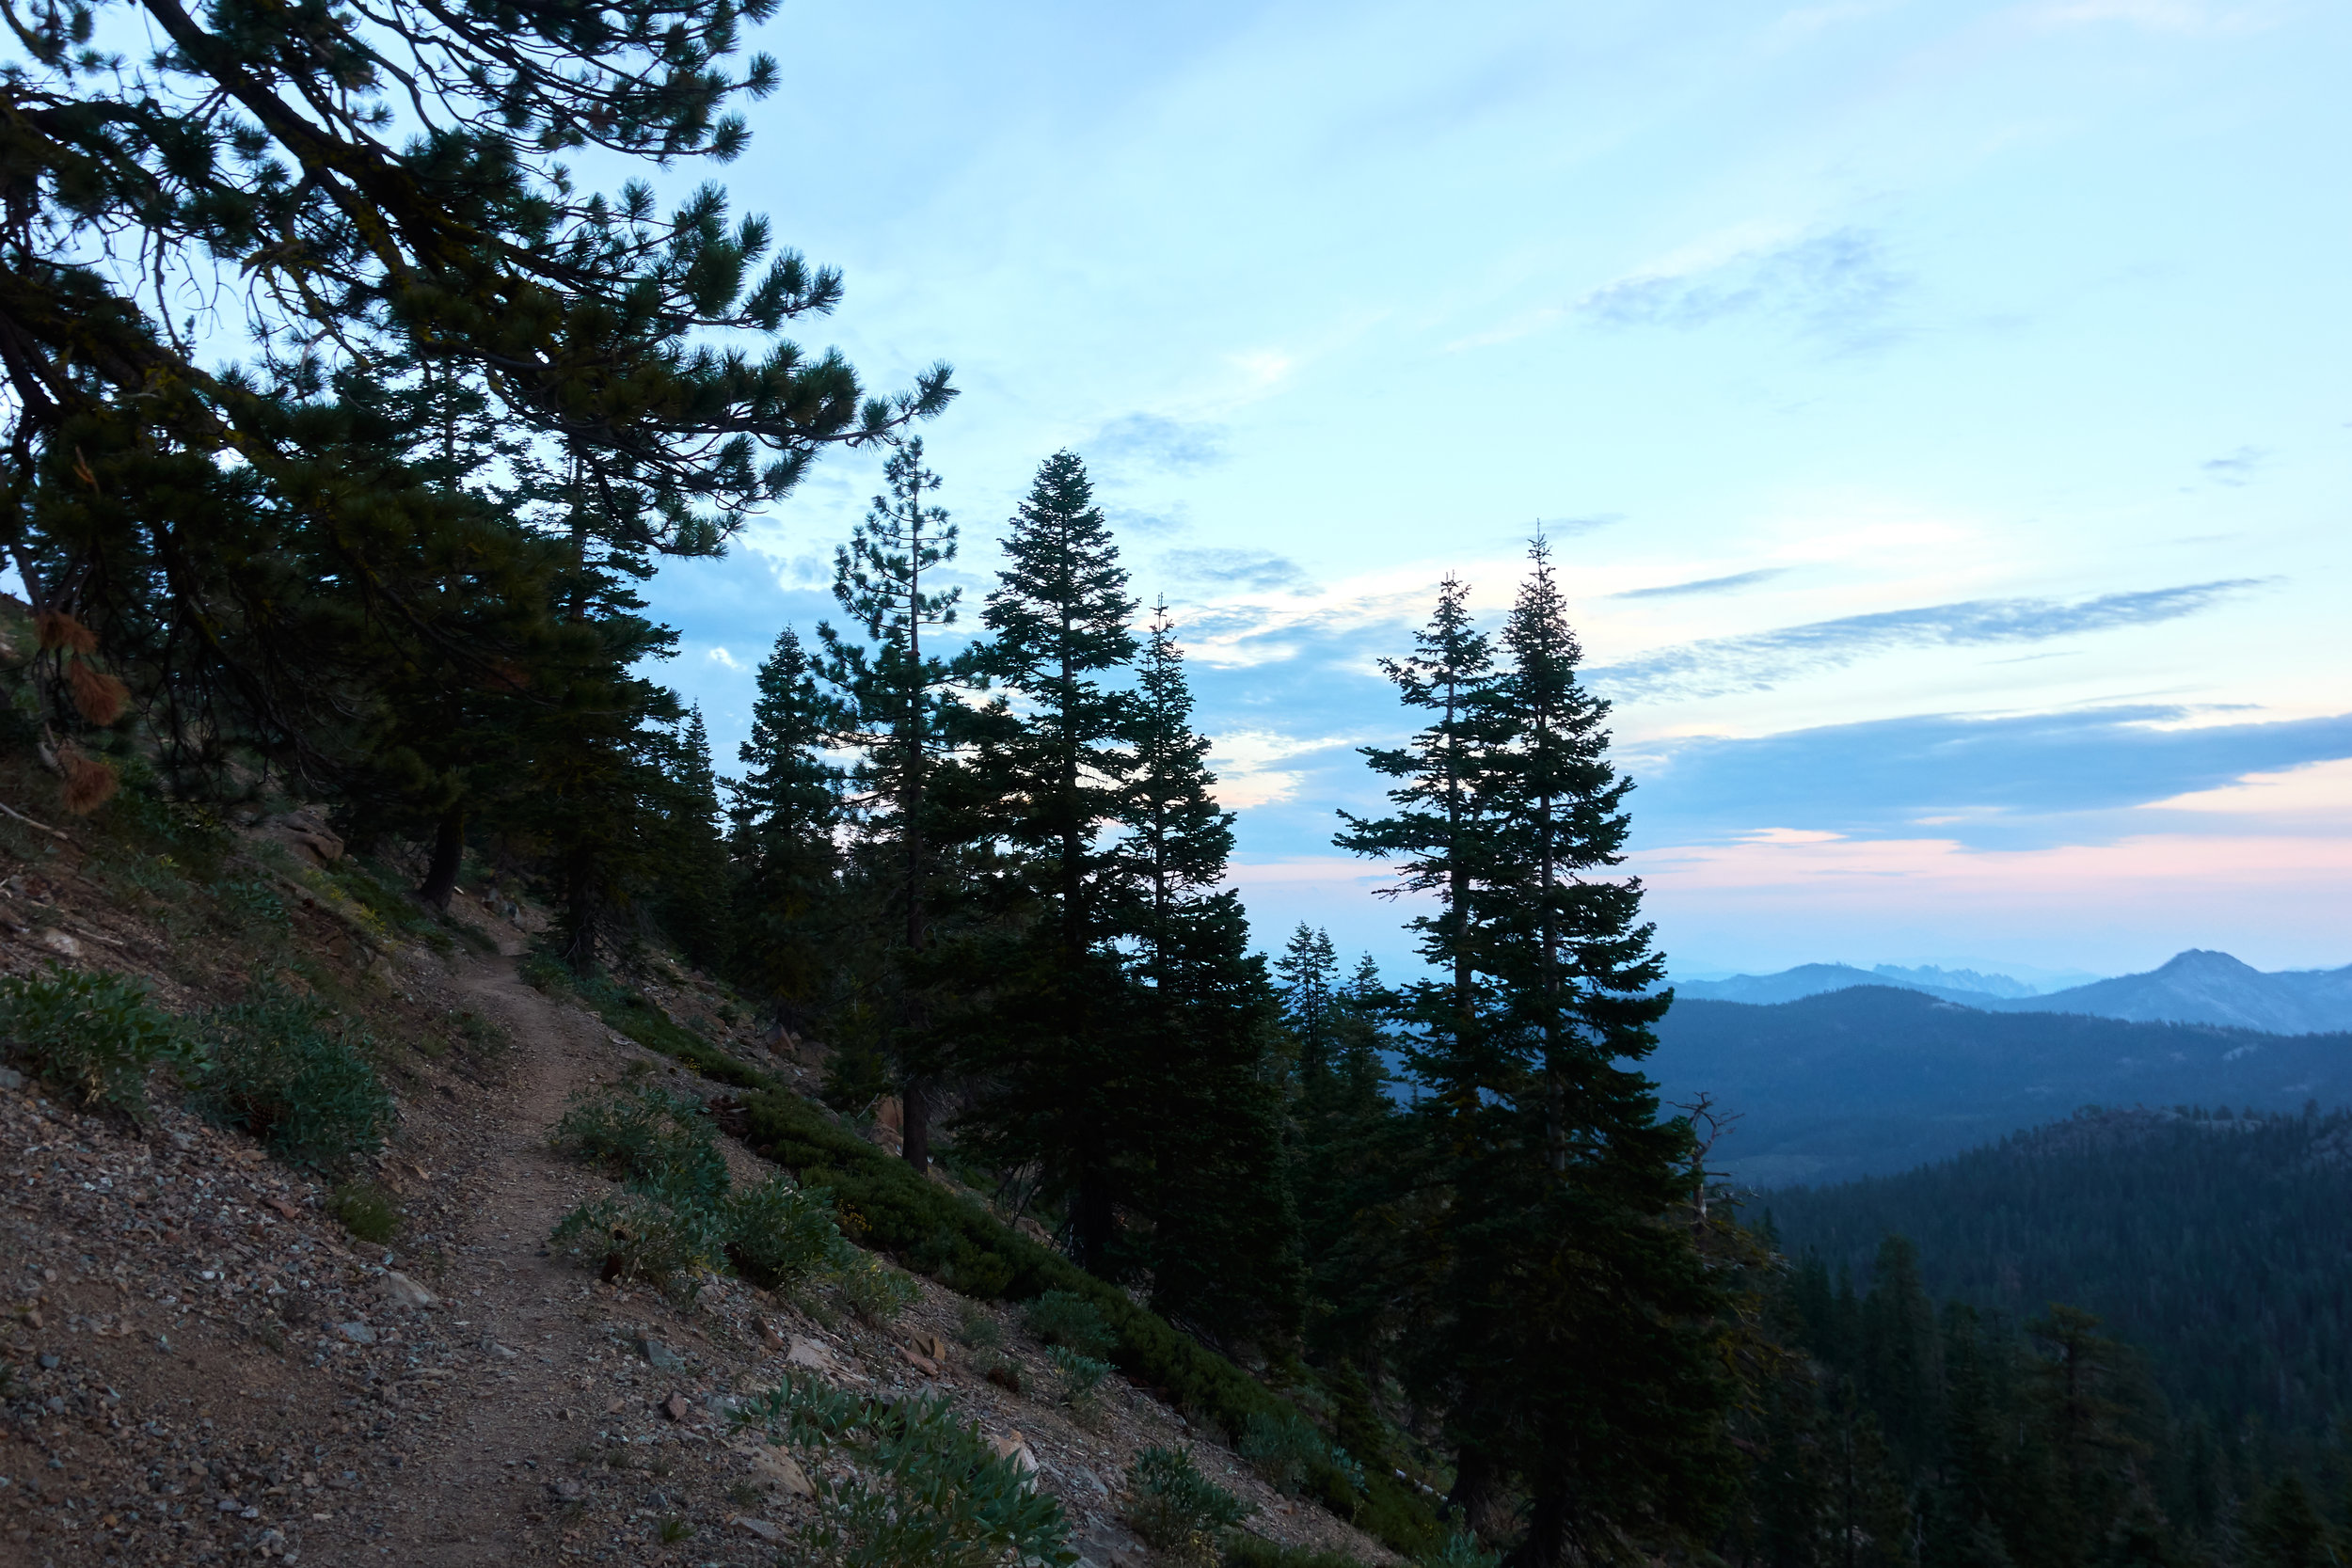 Climbing while the sun sets.